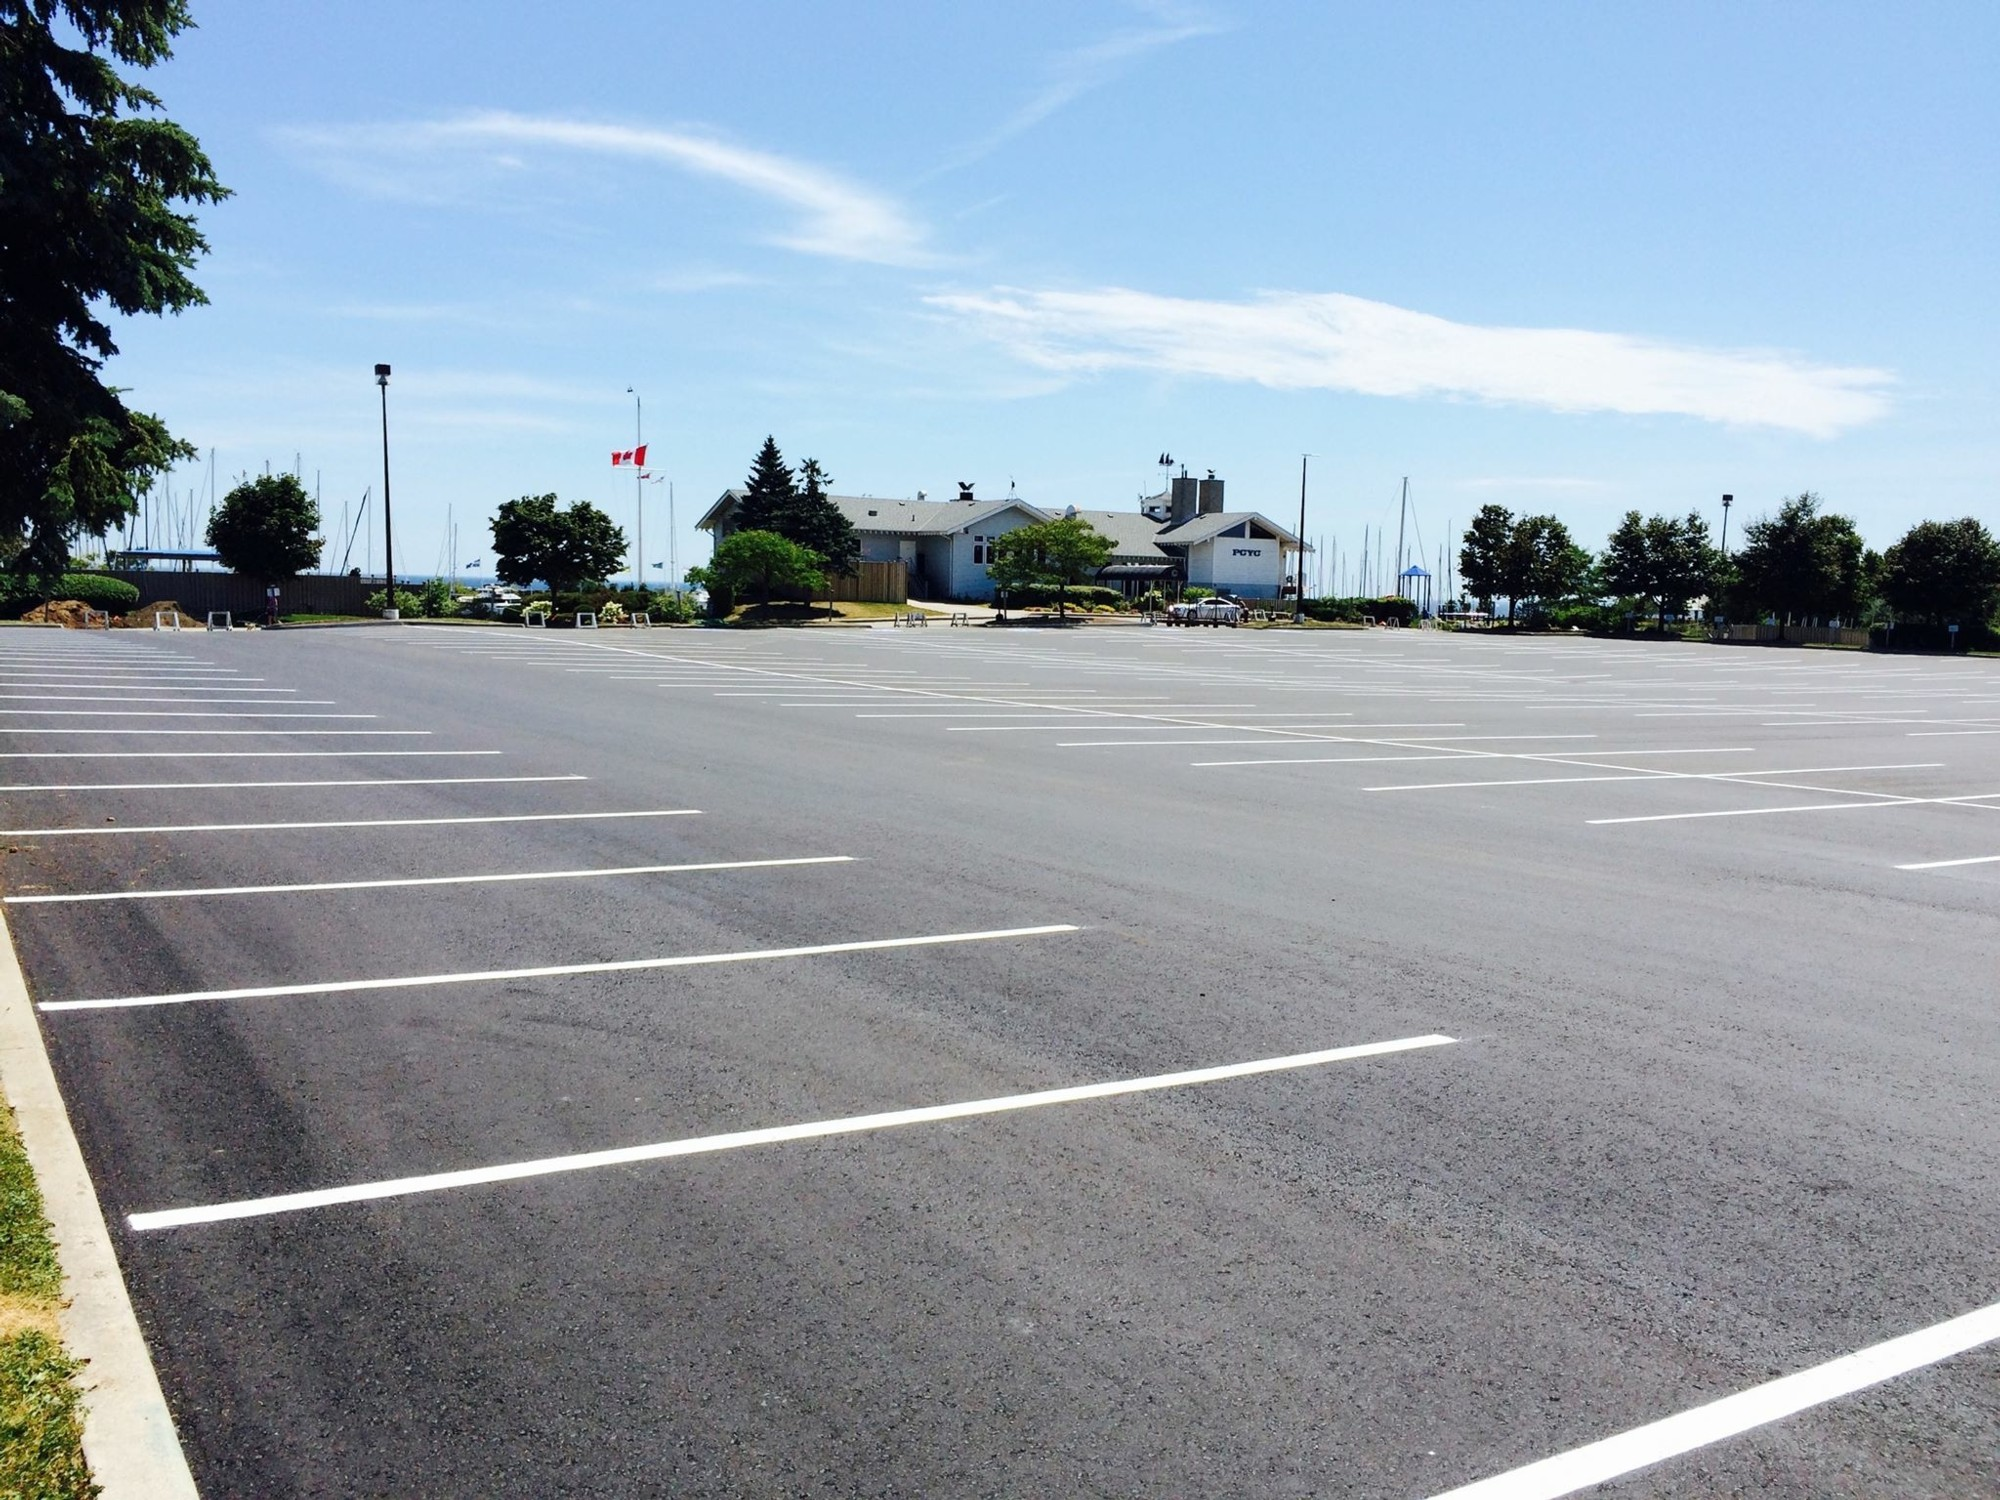 Parking at PCYC - Port Credit Yacht Club